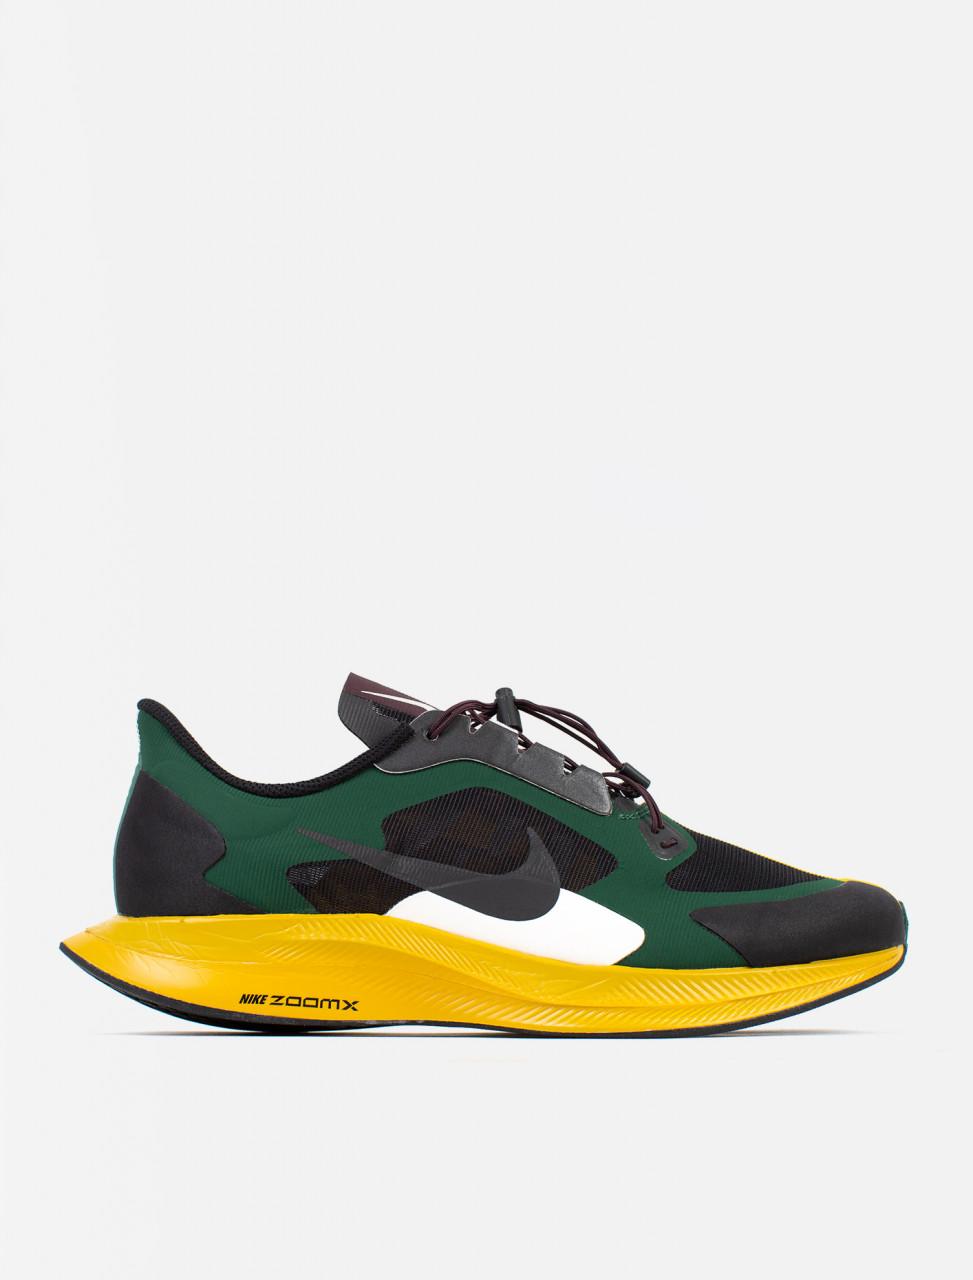 3199e8ae122920 Nike x Gyakusou Zoom Pegasus 35 Turbo Sneaker